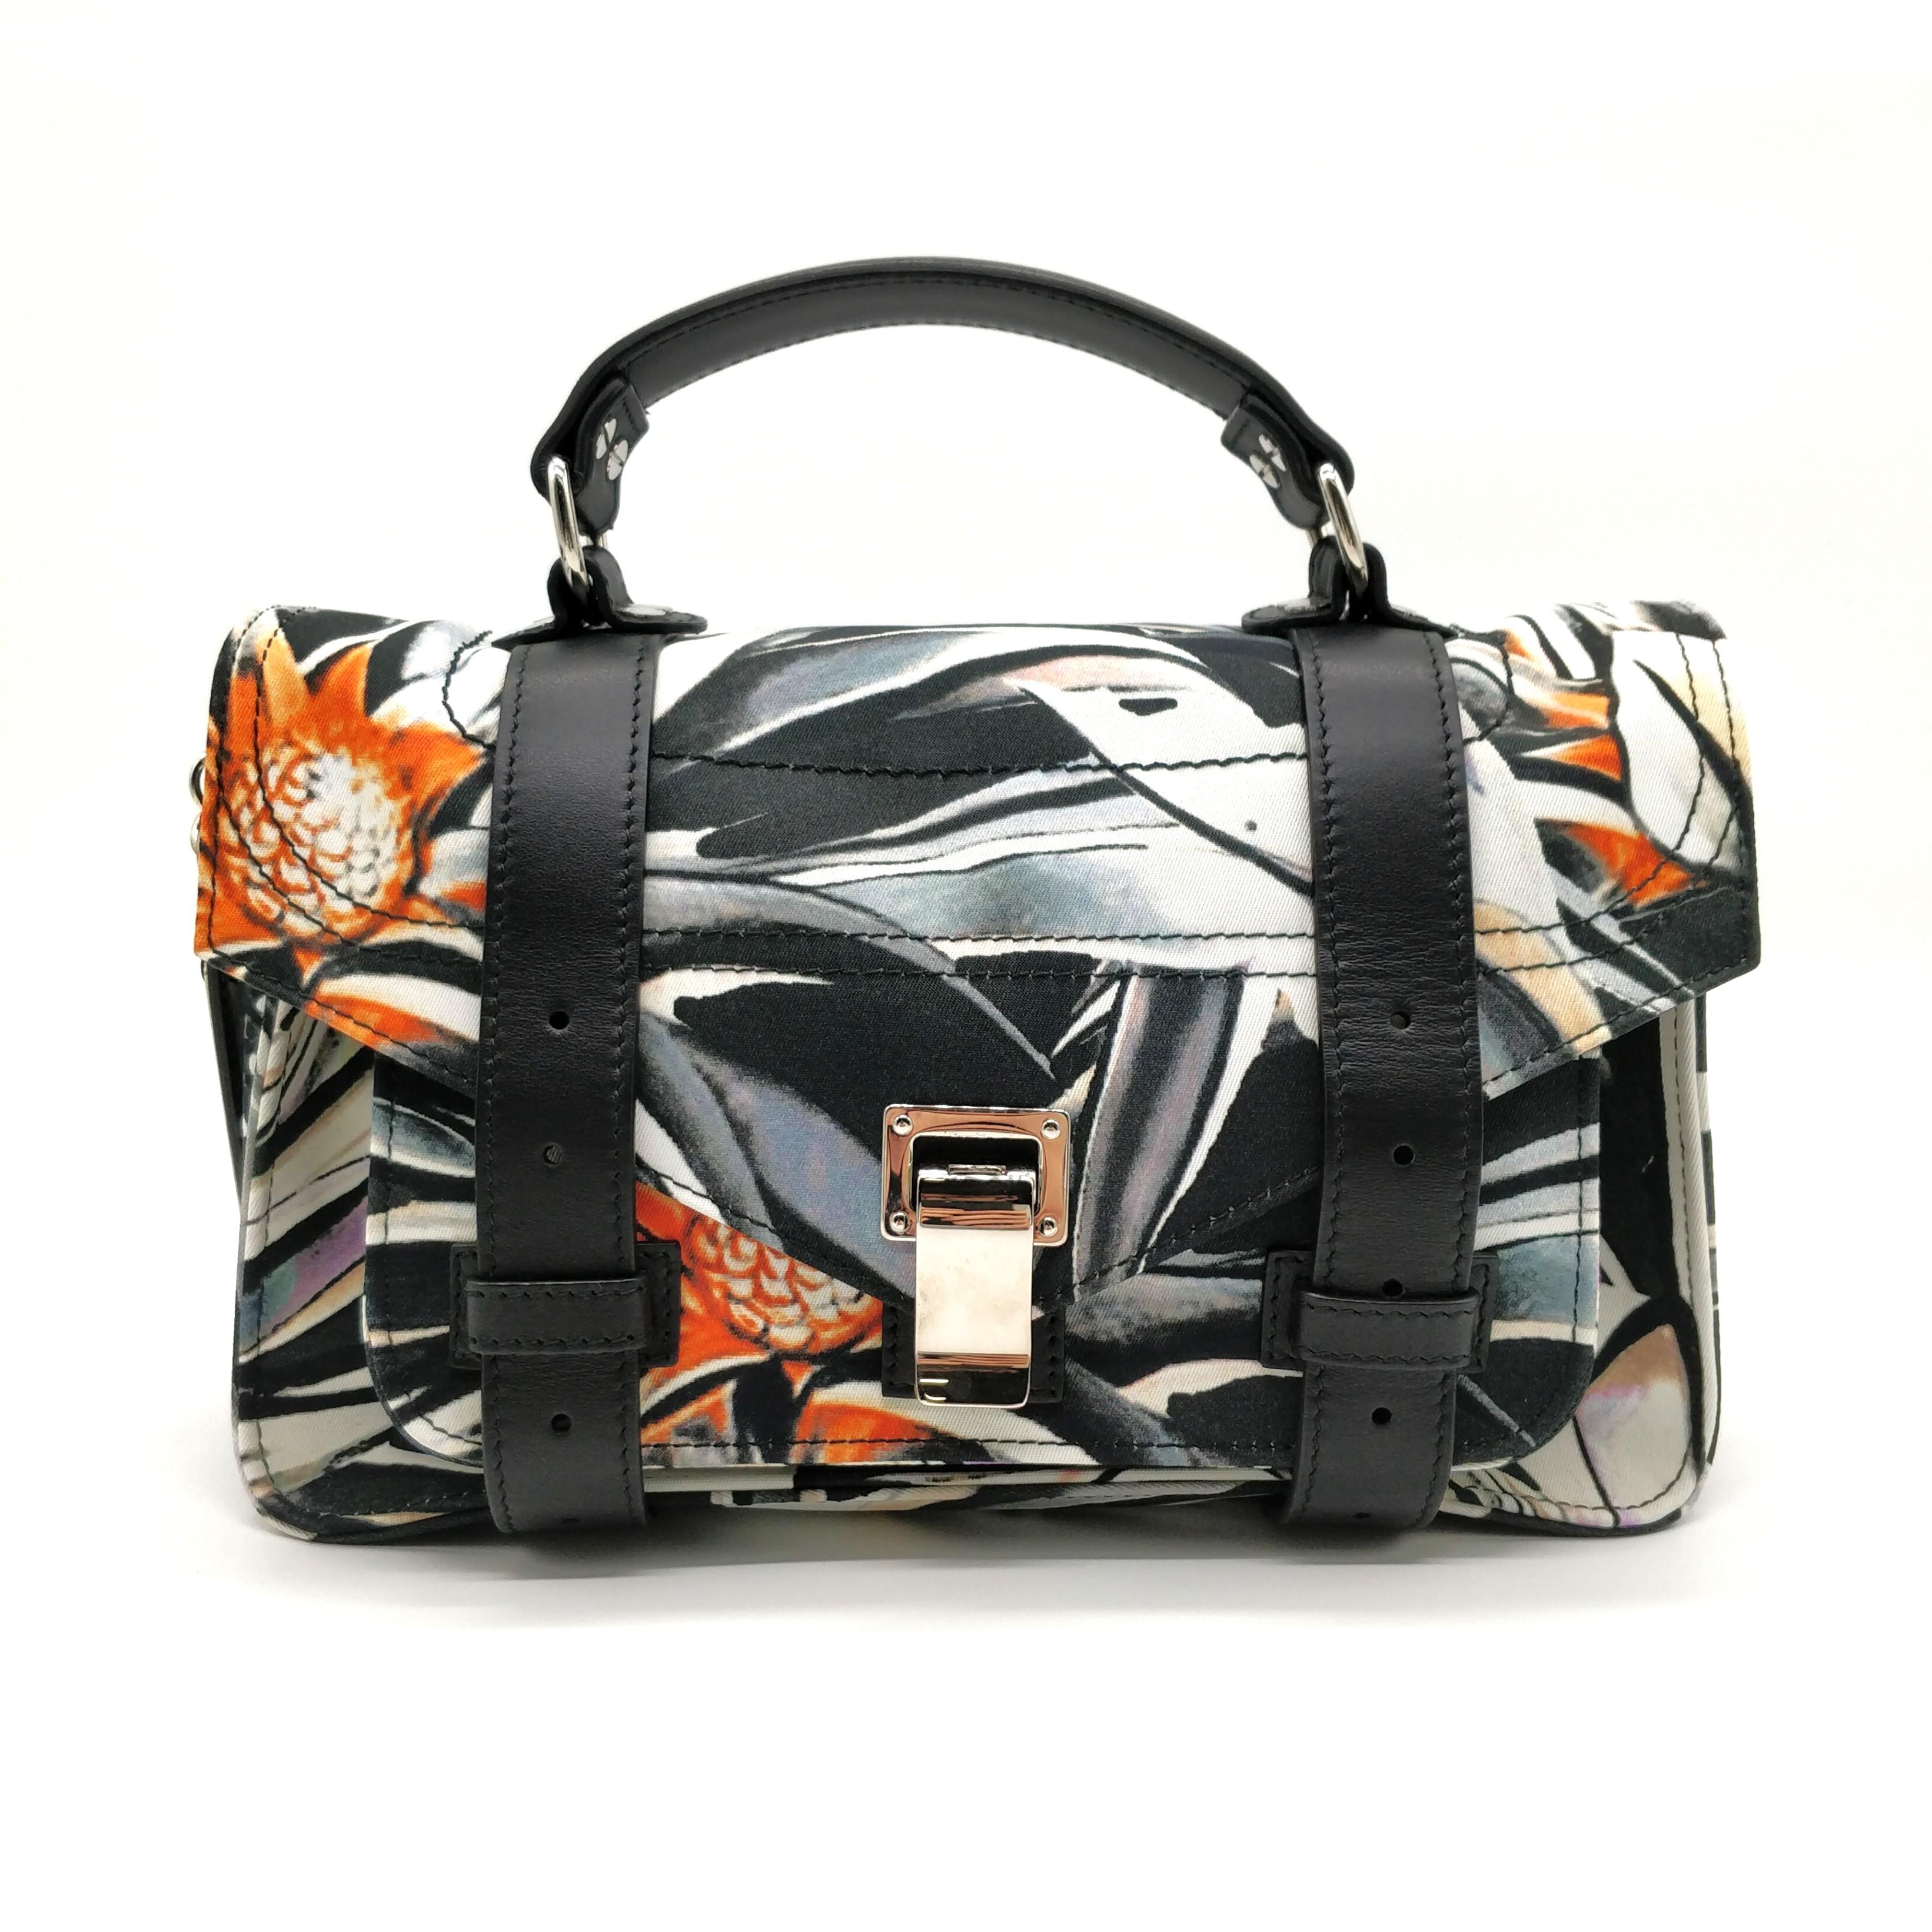 02e362c3298432 PROENZA SCHOULER PS1 Tiny Nylon Floral Print (Black/White), Luxury ...